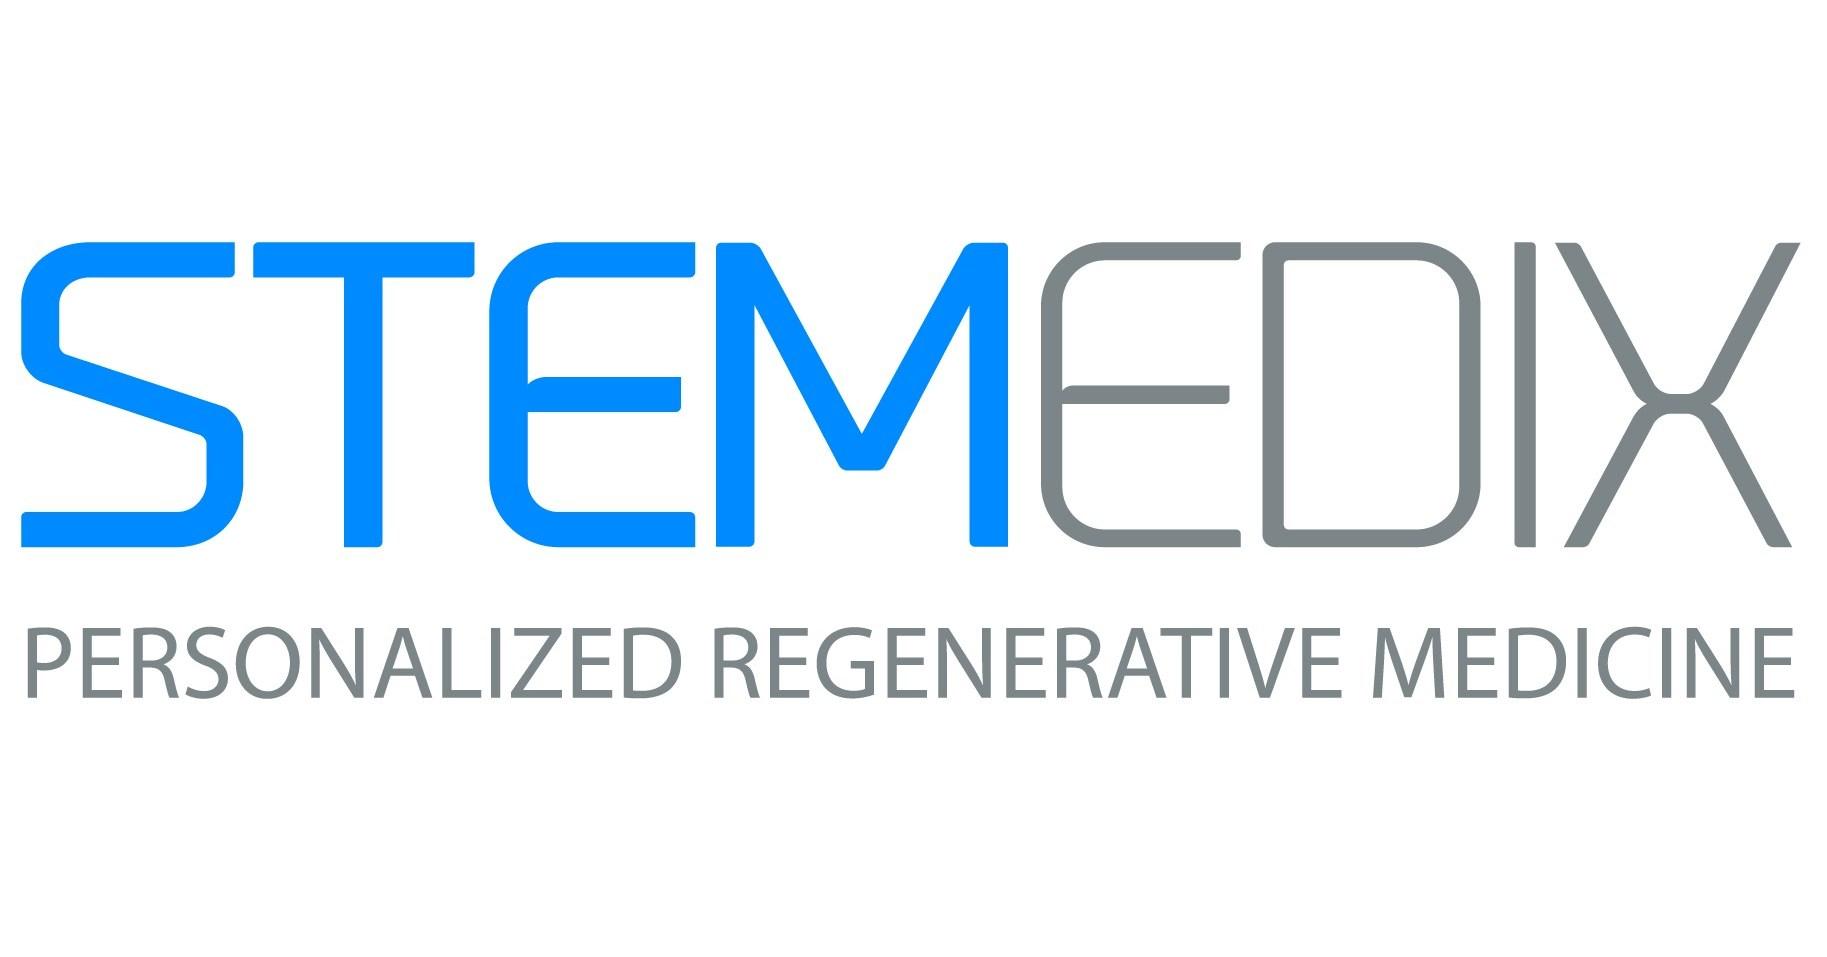 Stemedix